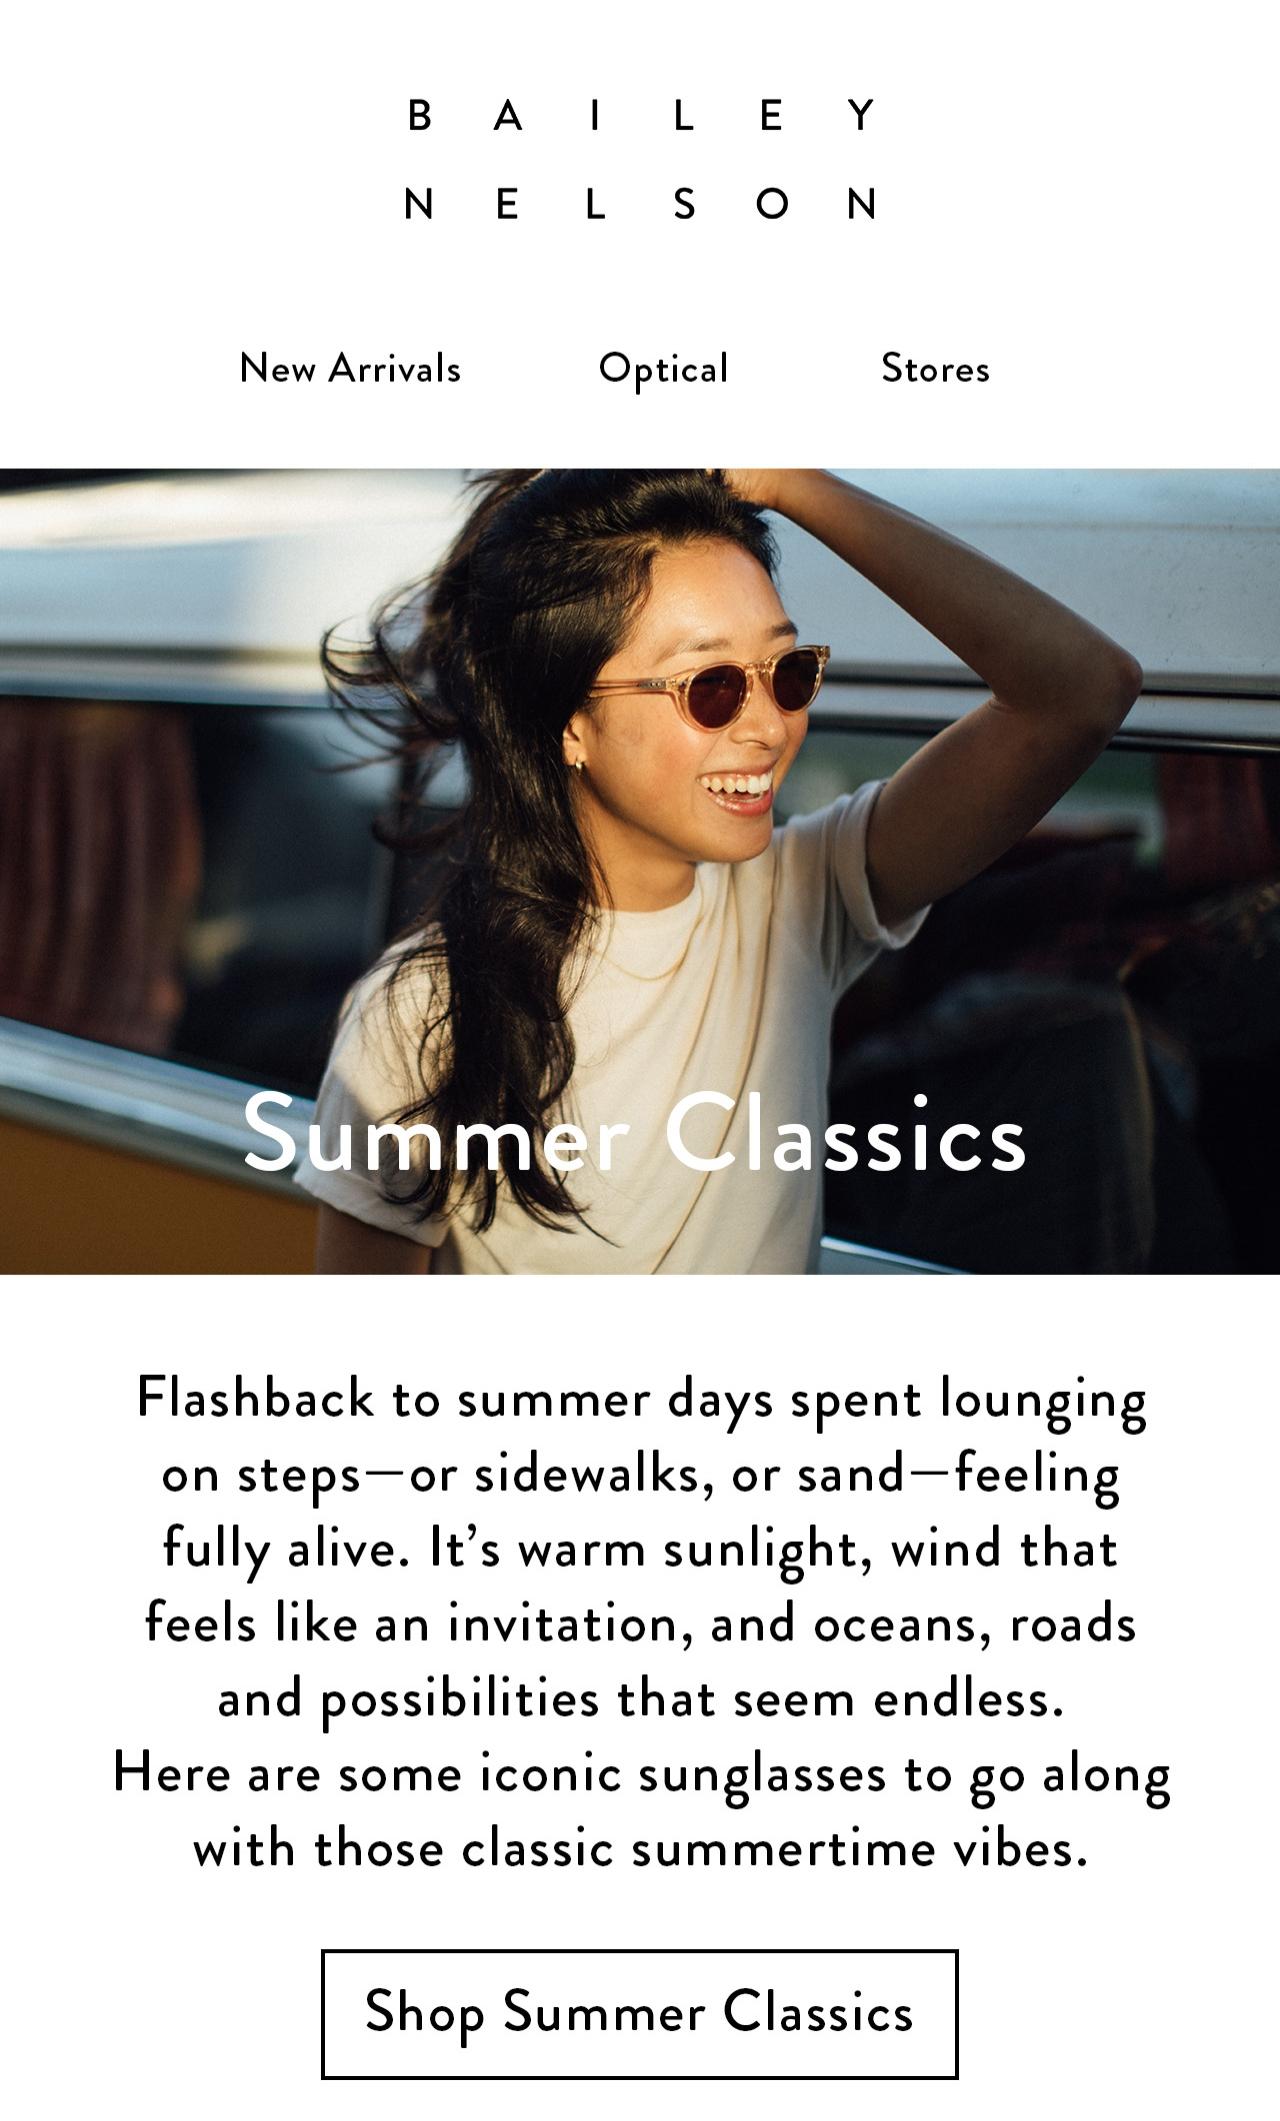 CAN_EDM_Sunglasses_July6 (2).jpg